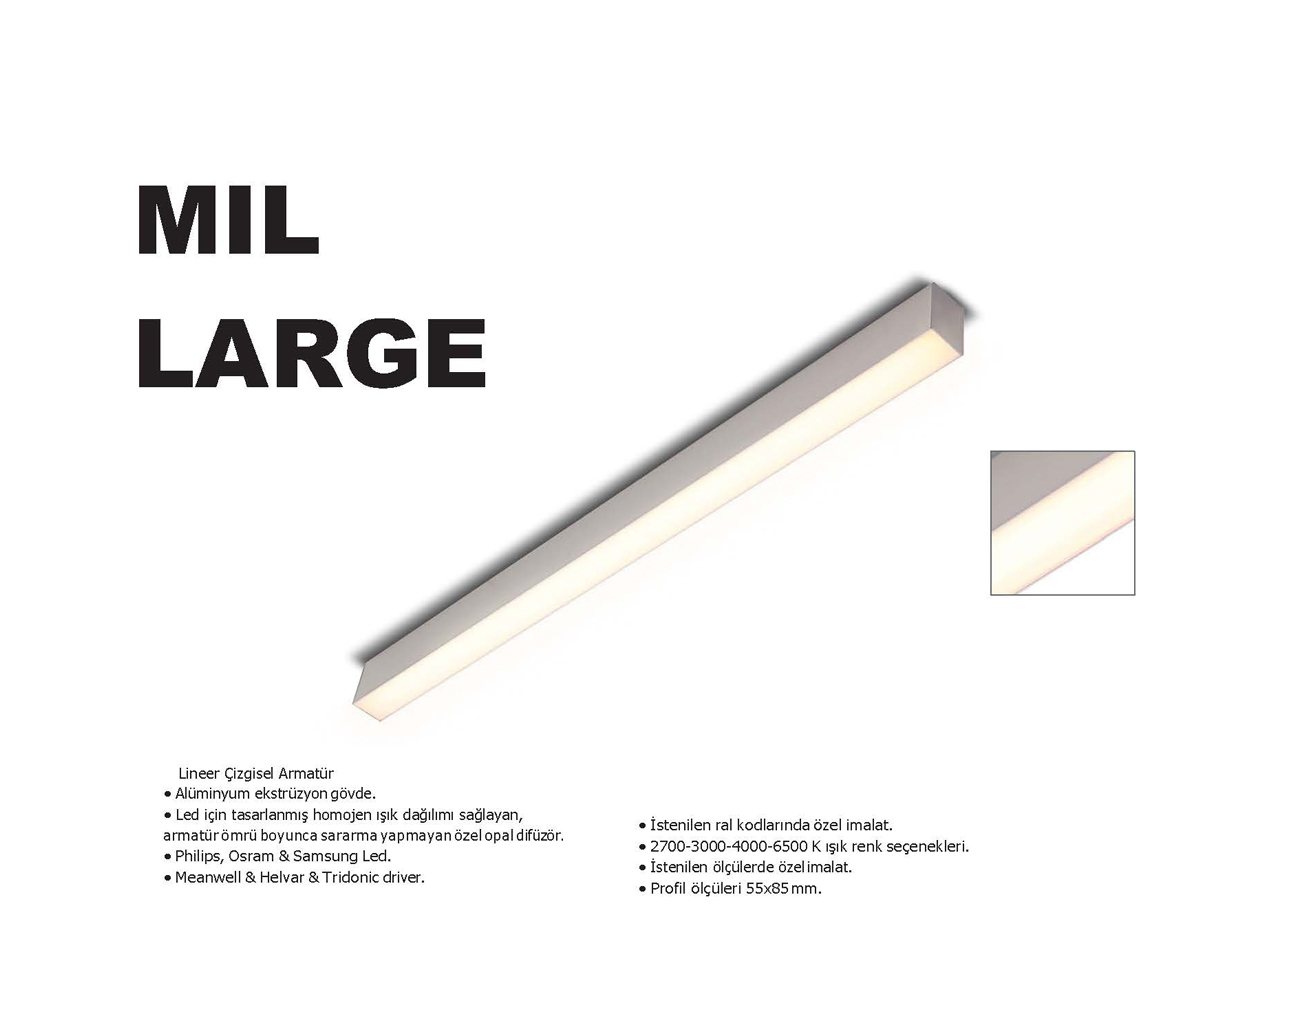 MIL Large